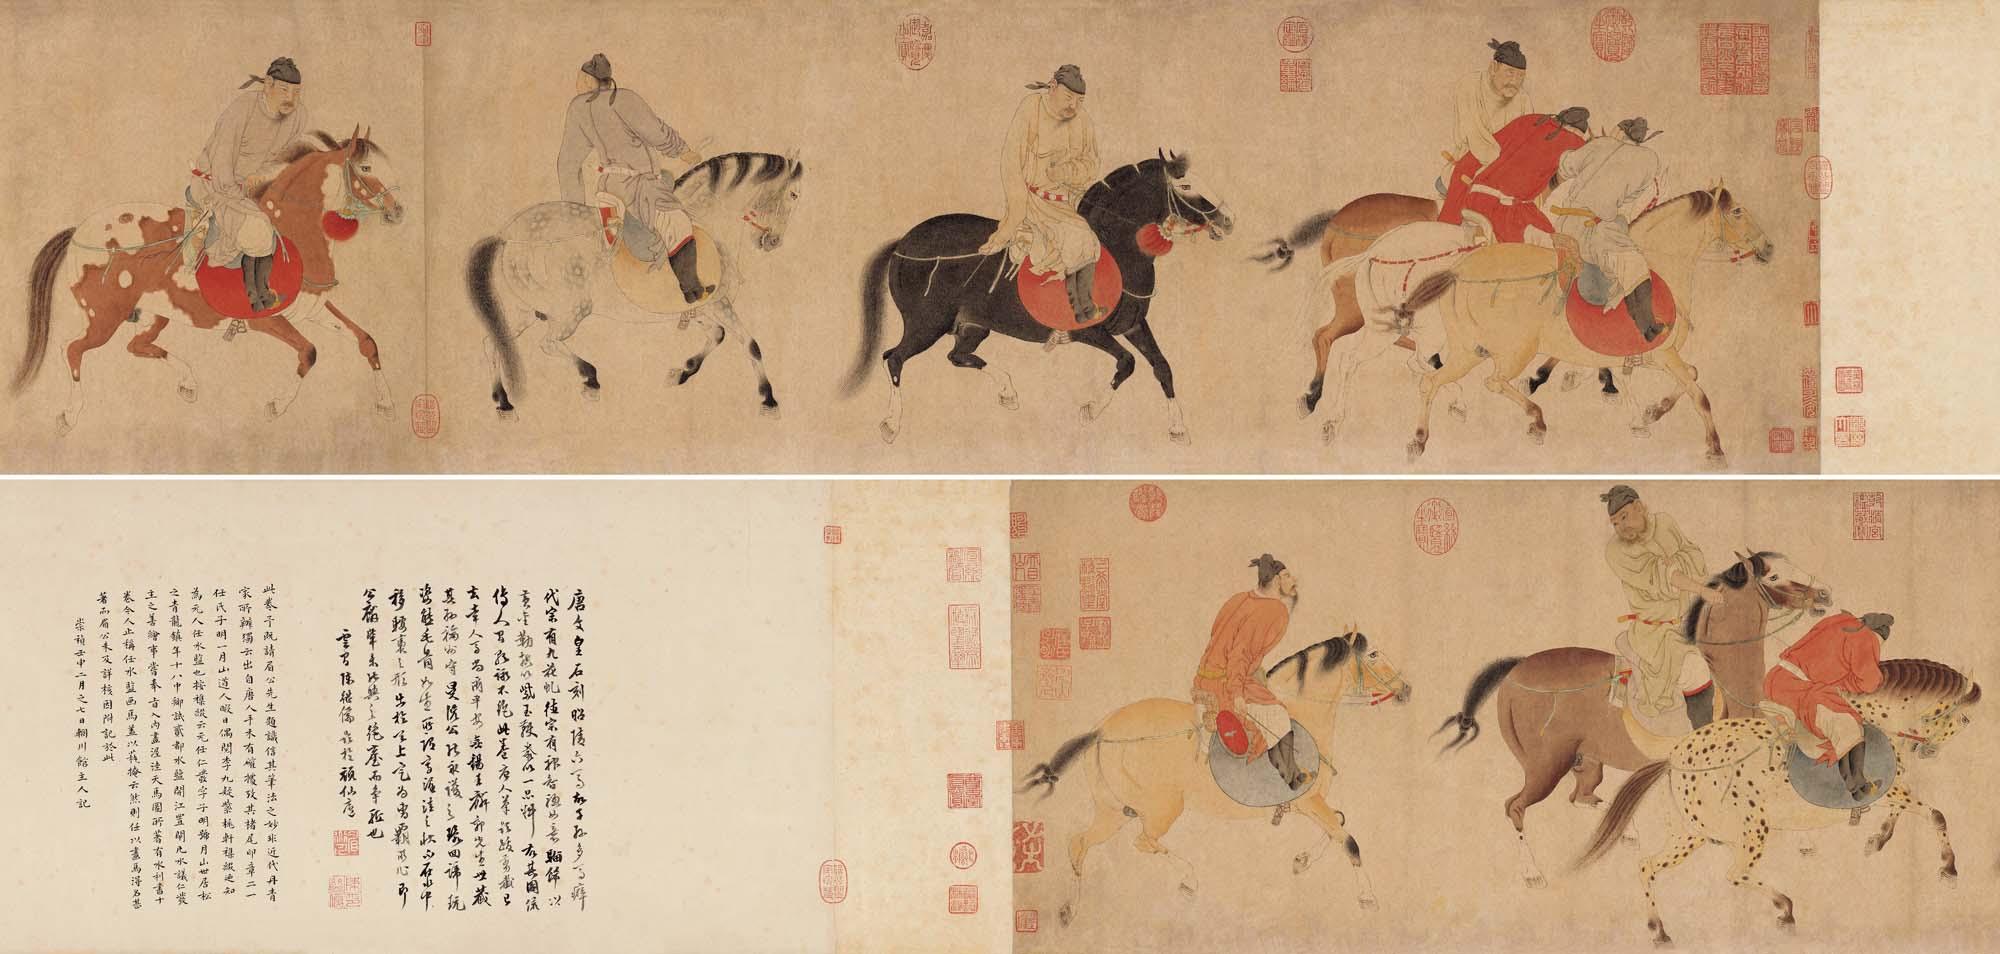 Свиток династии Юань продан на аукционе Beijing Poly за 4,3 млн долларов